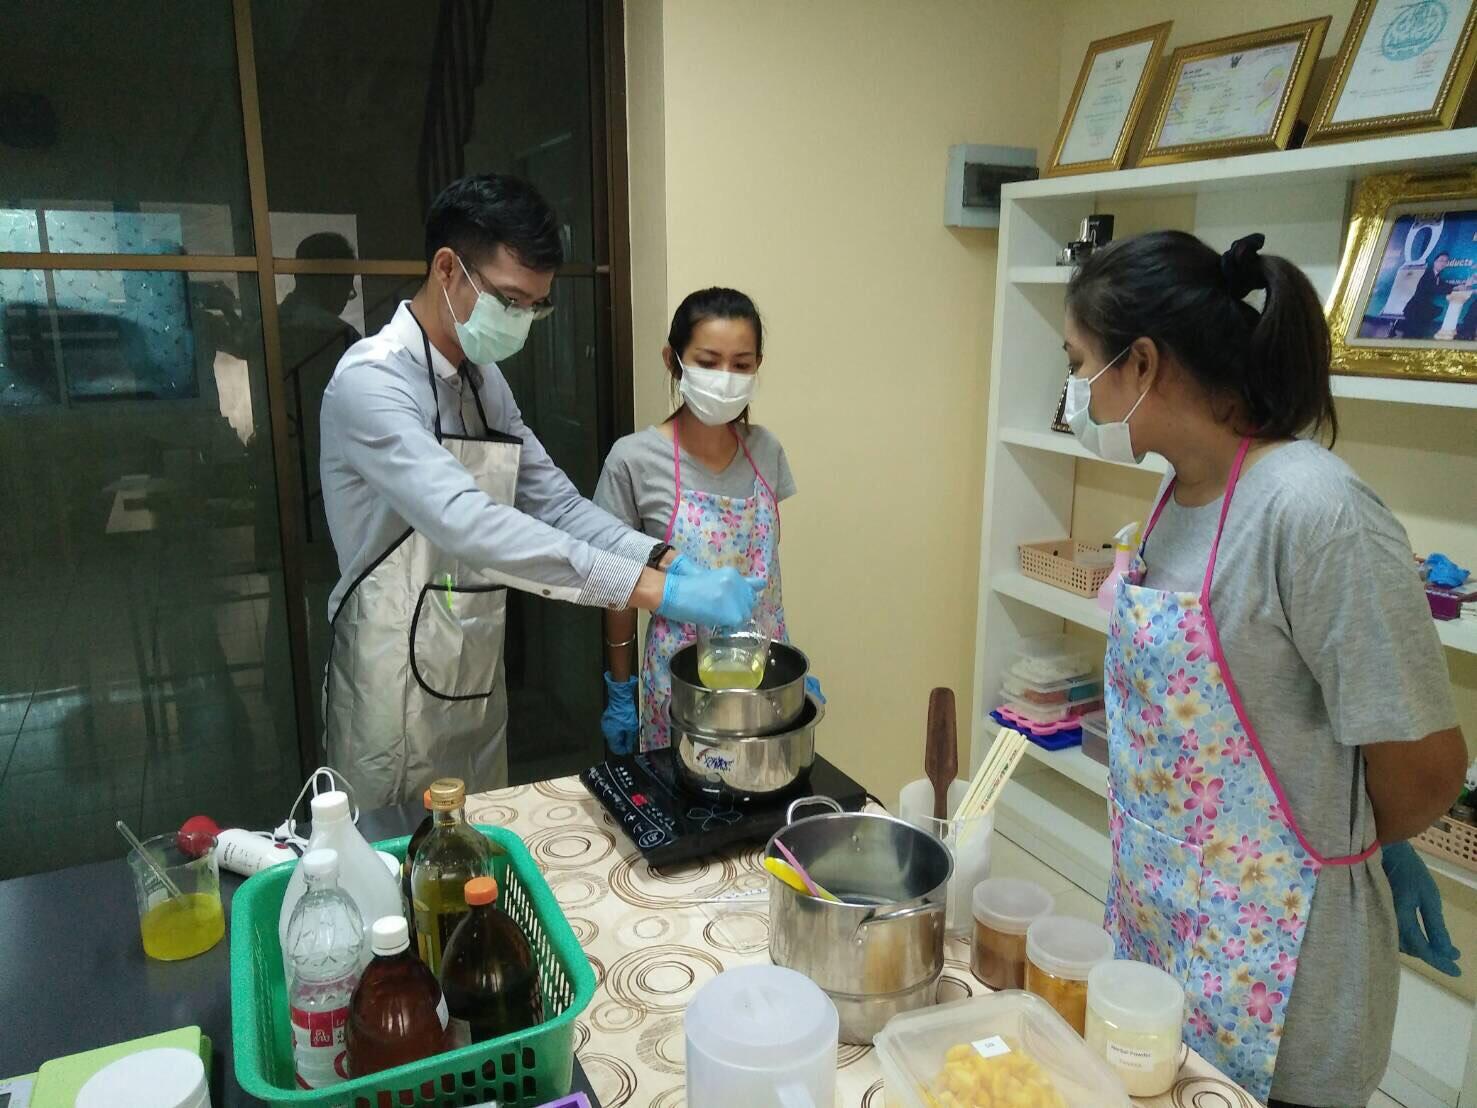 soap maker วิธีทำสบู่ สอนทำสบู่4